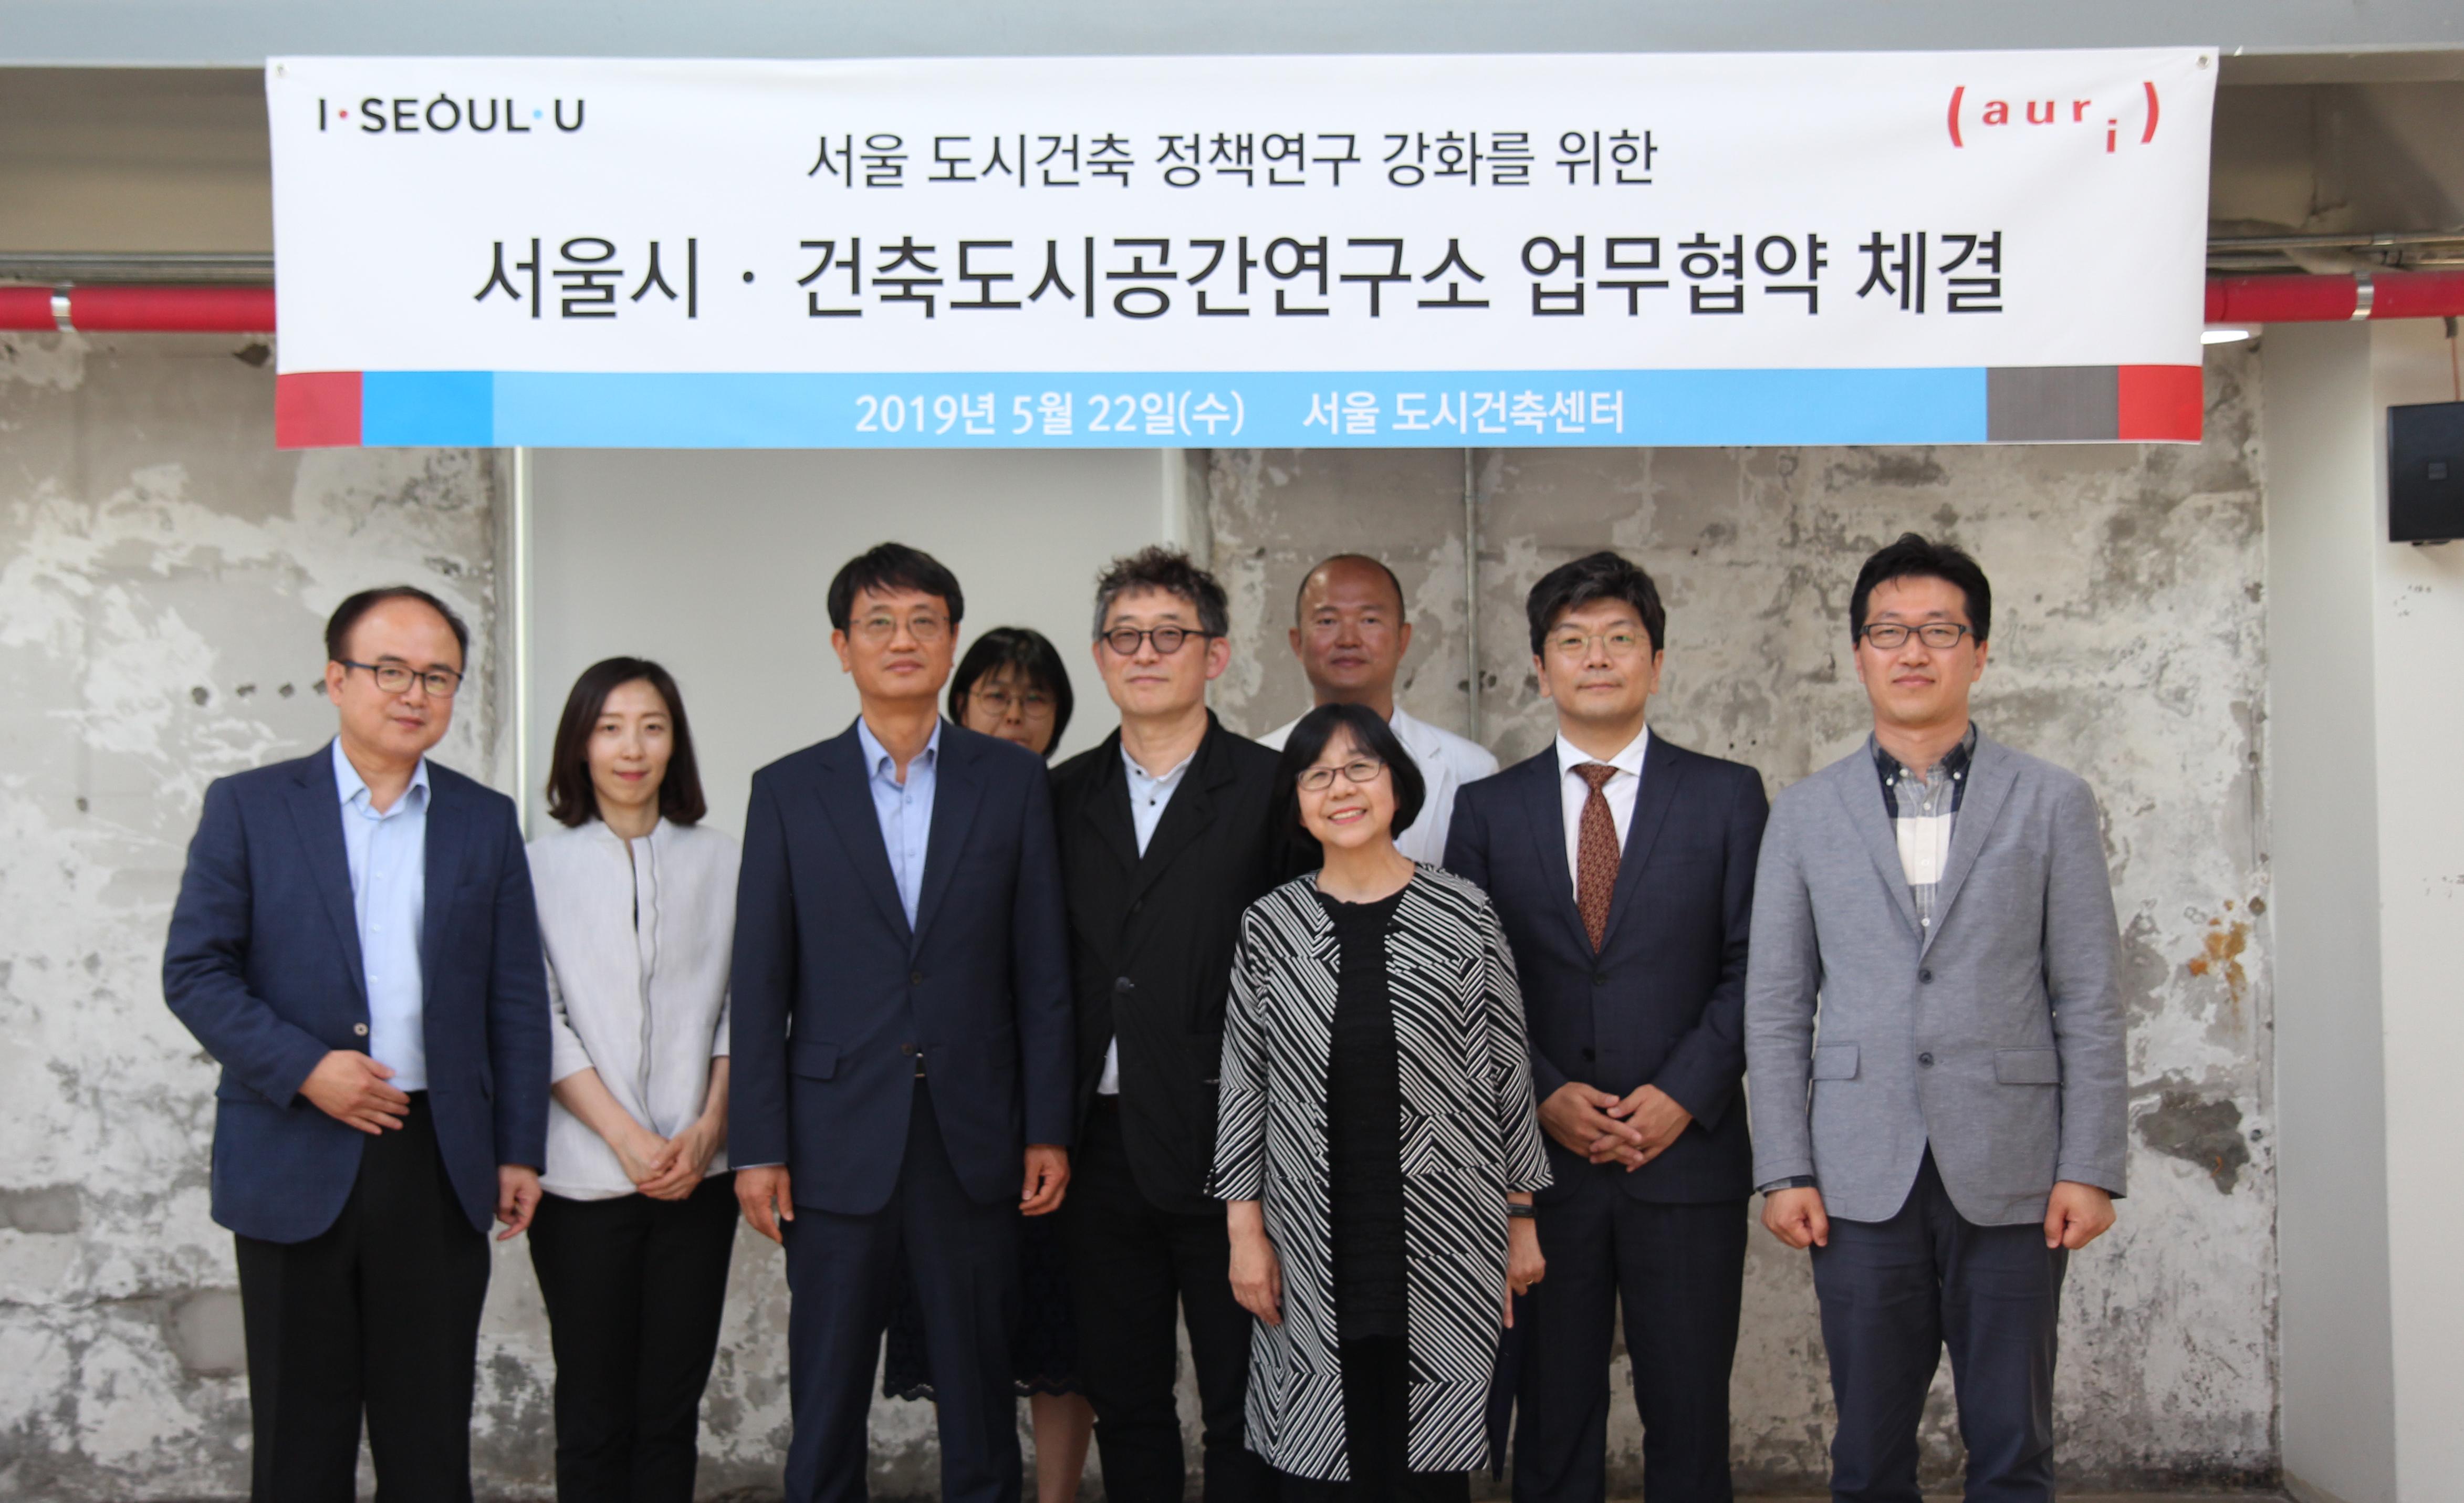 〔ANN의 뉴스 탐방〕건축도시공간연구소와 서울시 학술·연구 교류 협약 체결해